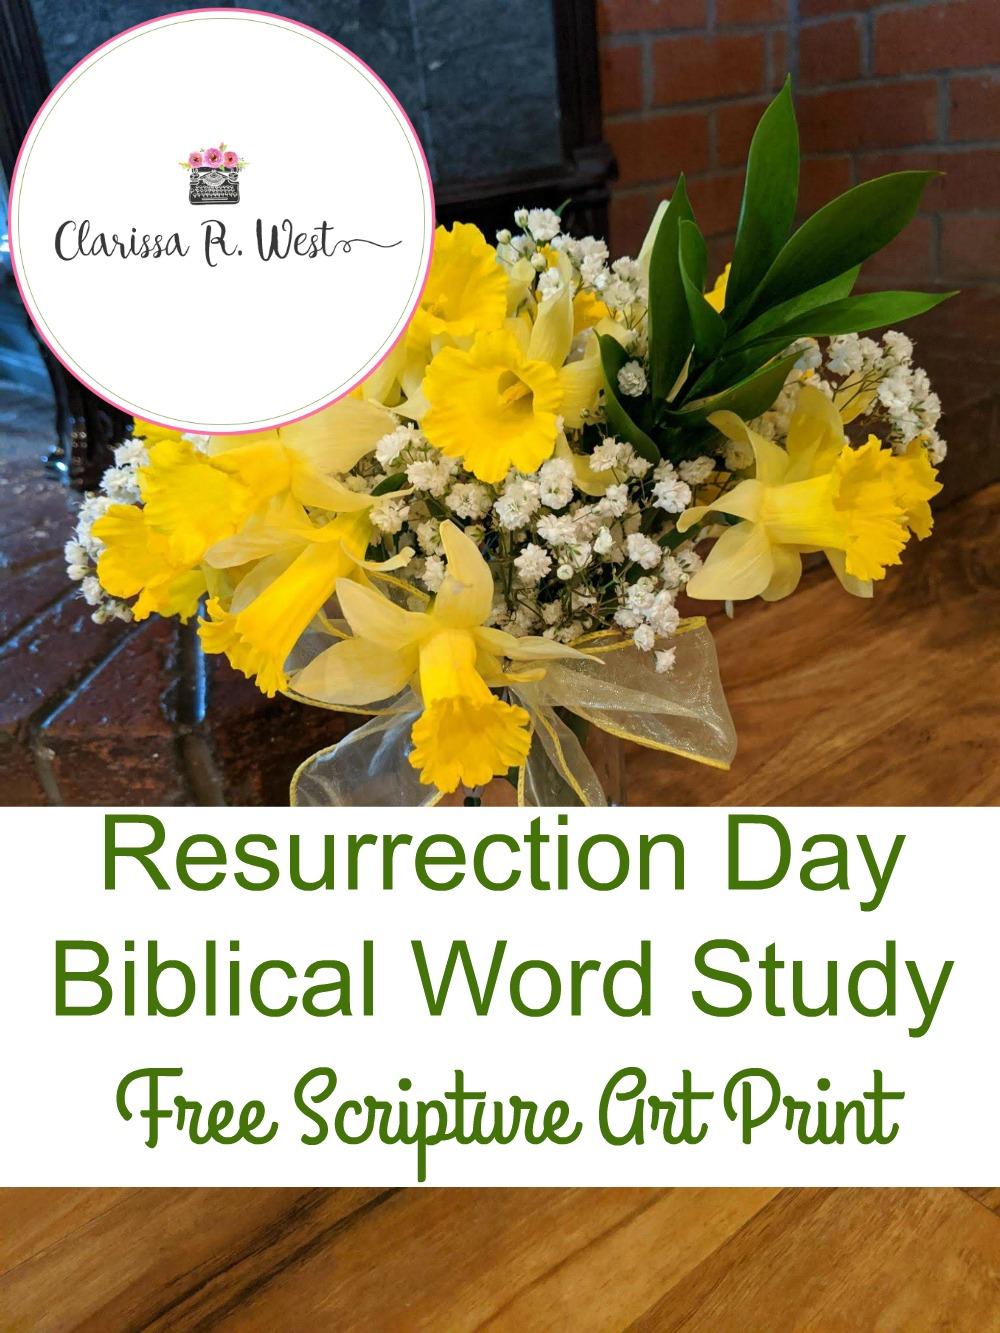 Resurrection Day Biblical Word Study | FREE Scripture Art Print